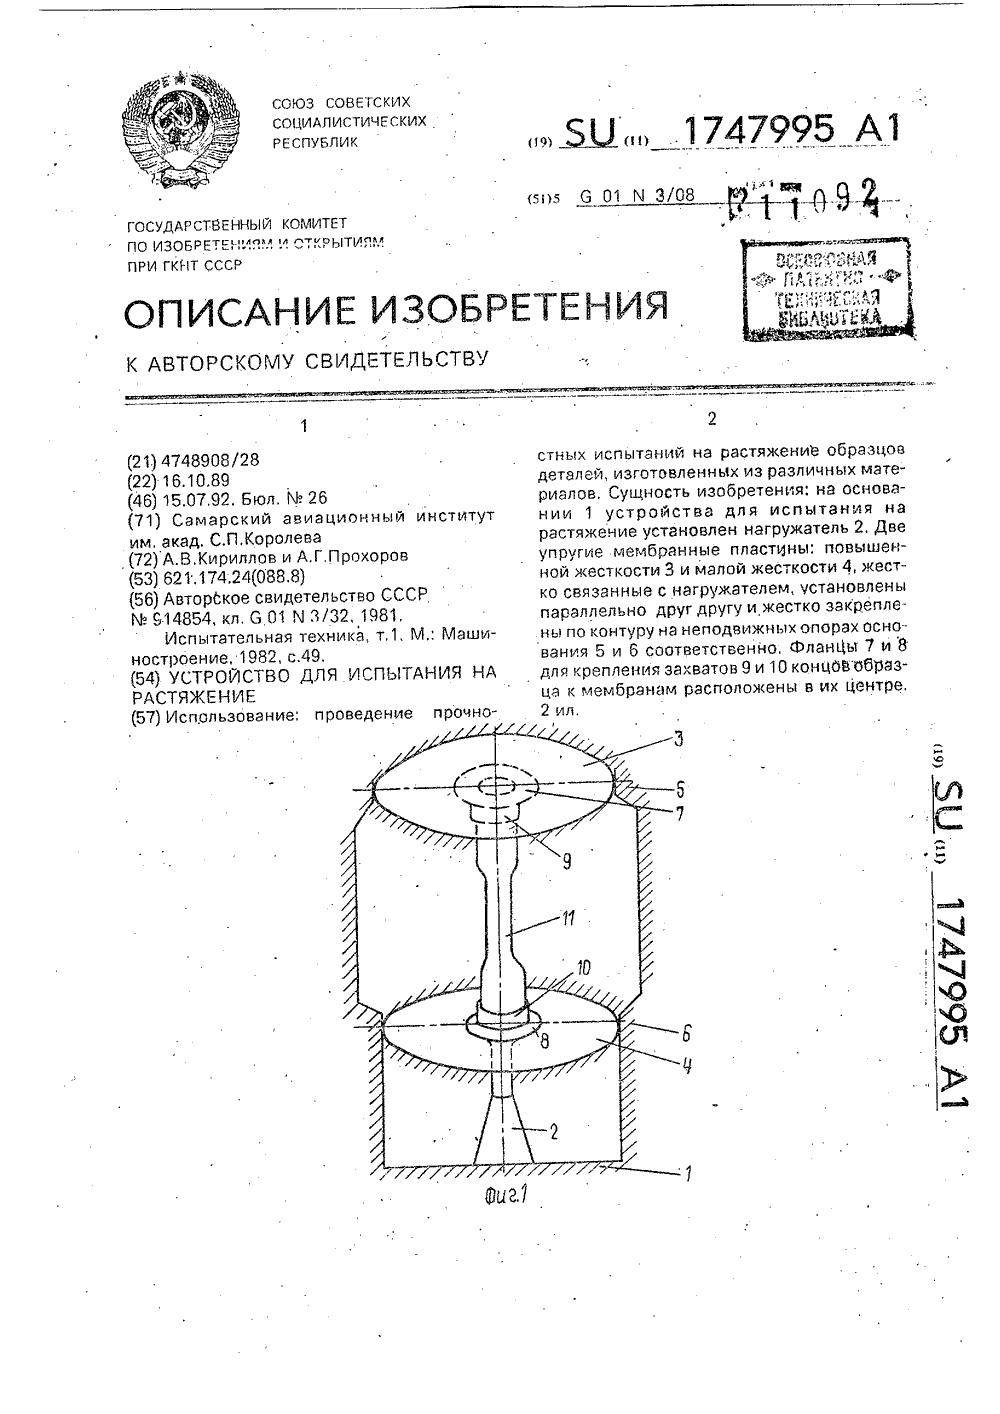 стабилометр схема нагрузка-разгрузка